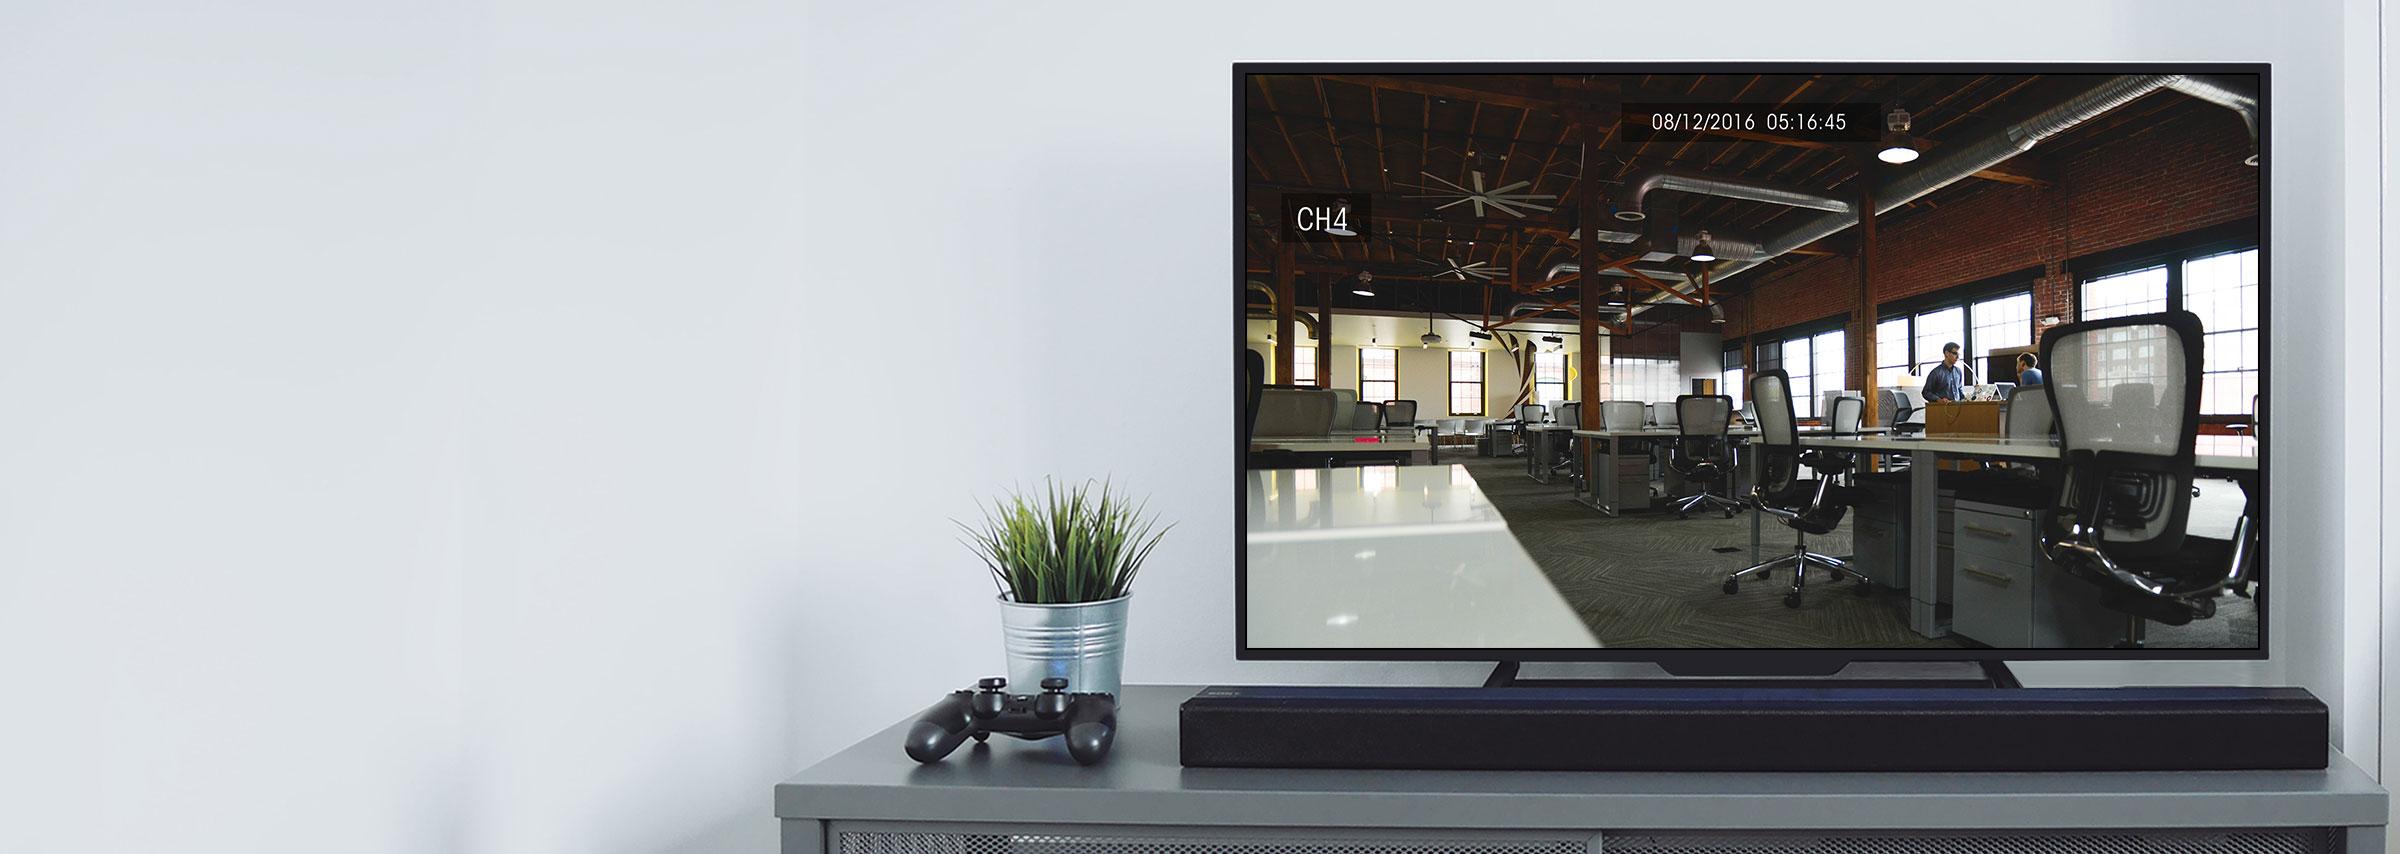 Large Screen Viewing